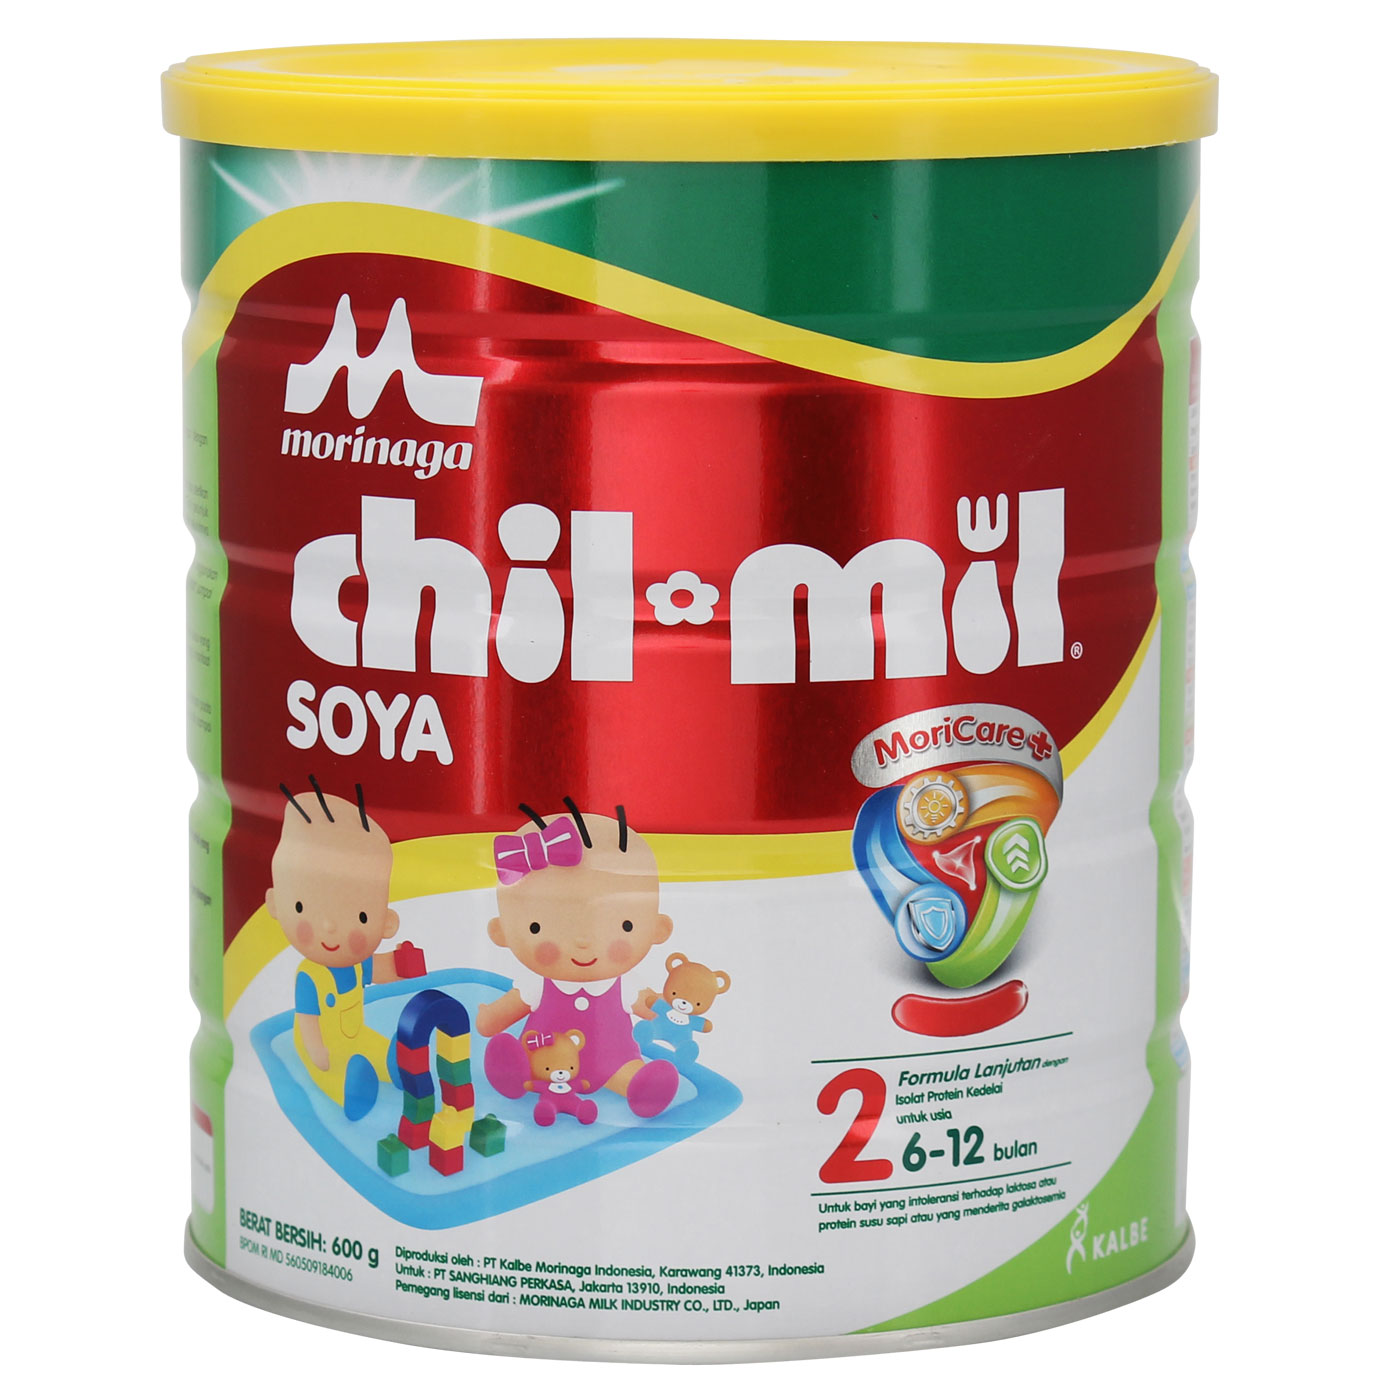 Morinaga Chil Mil Soya 600gr Tin 1